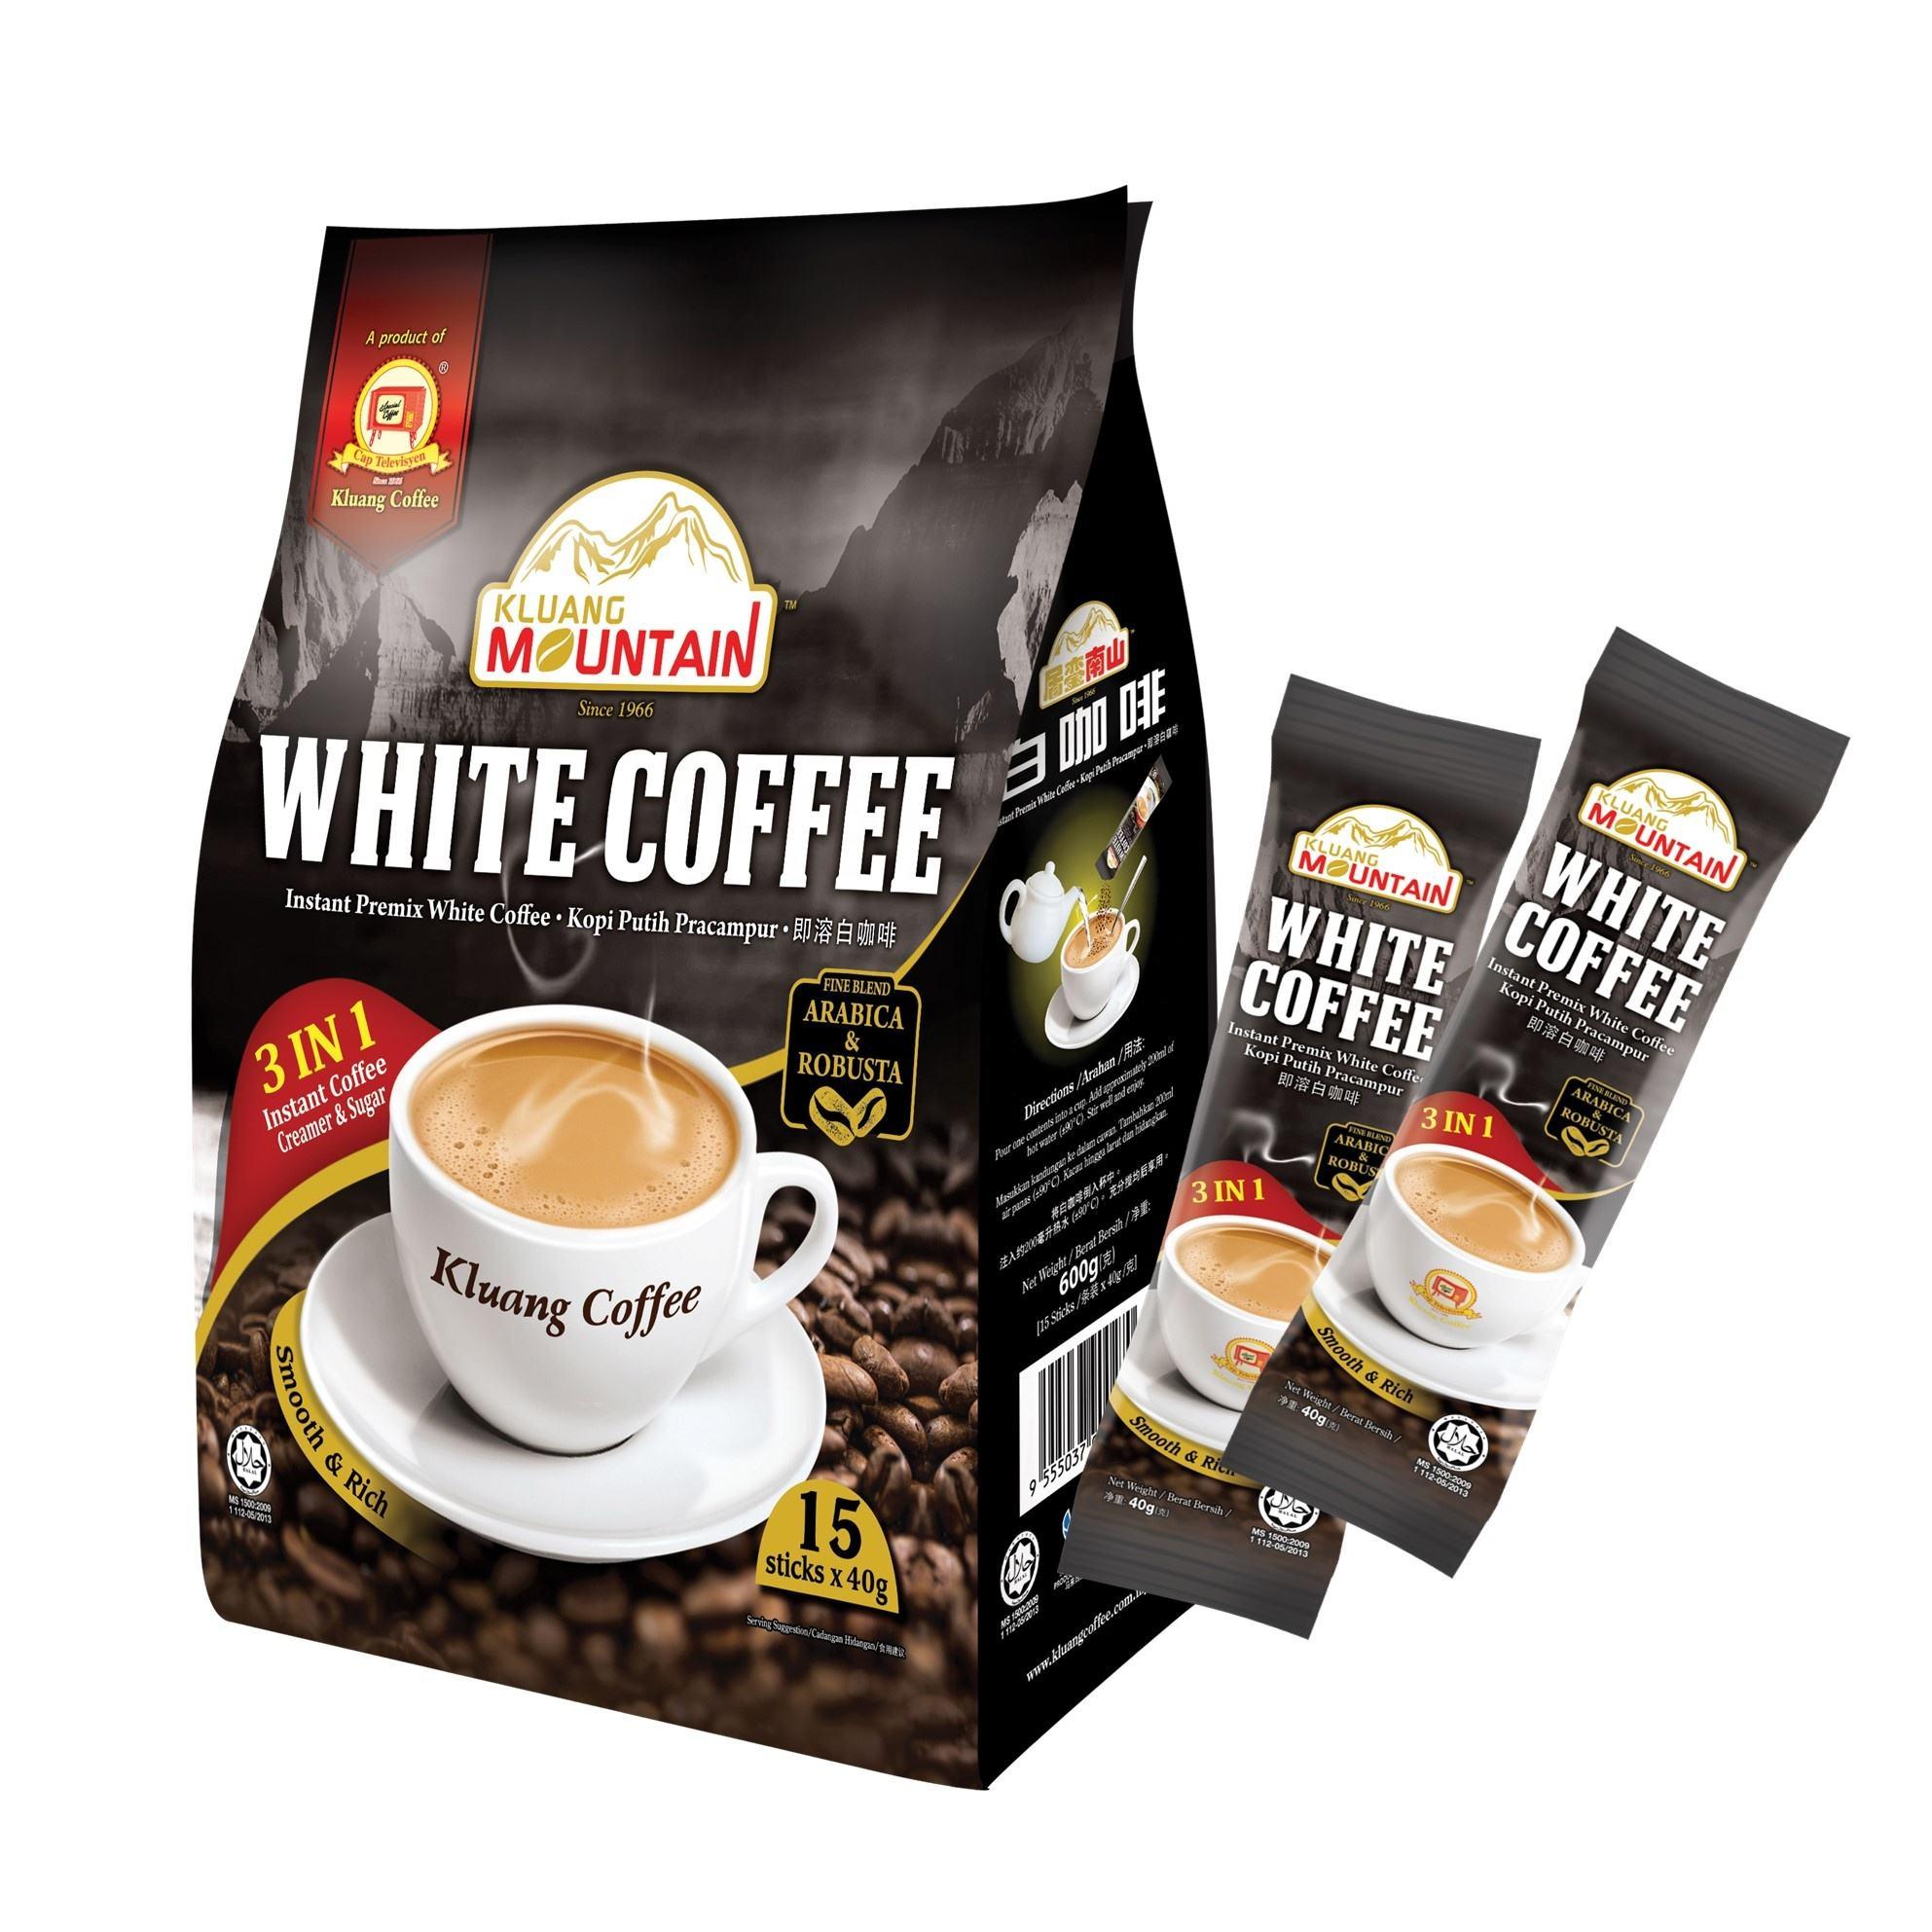 Kluang Mountain Instant White Coffee 3 in 1 Malaysia HALAL (15 sticks x 40g) Televisyen Brand Net Weight 600g